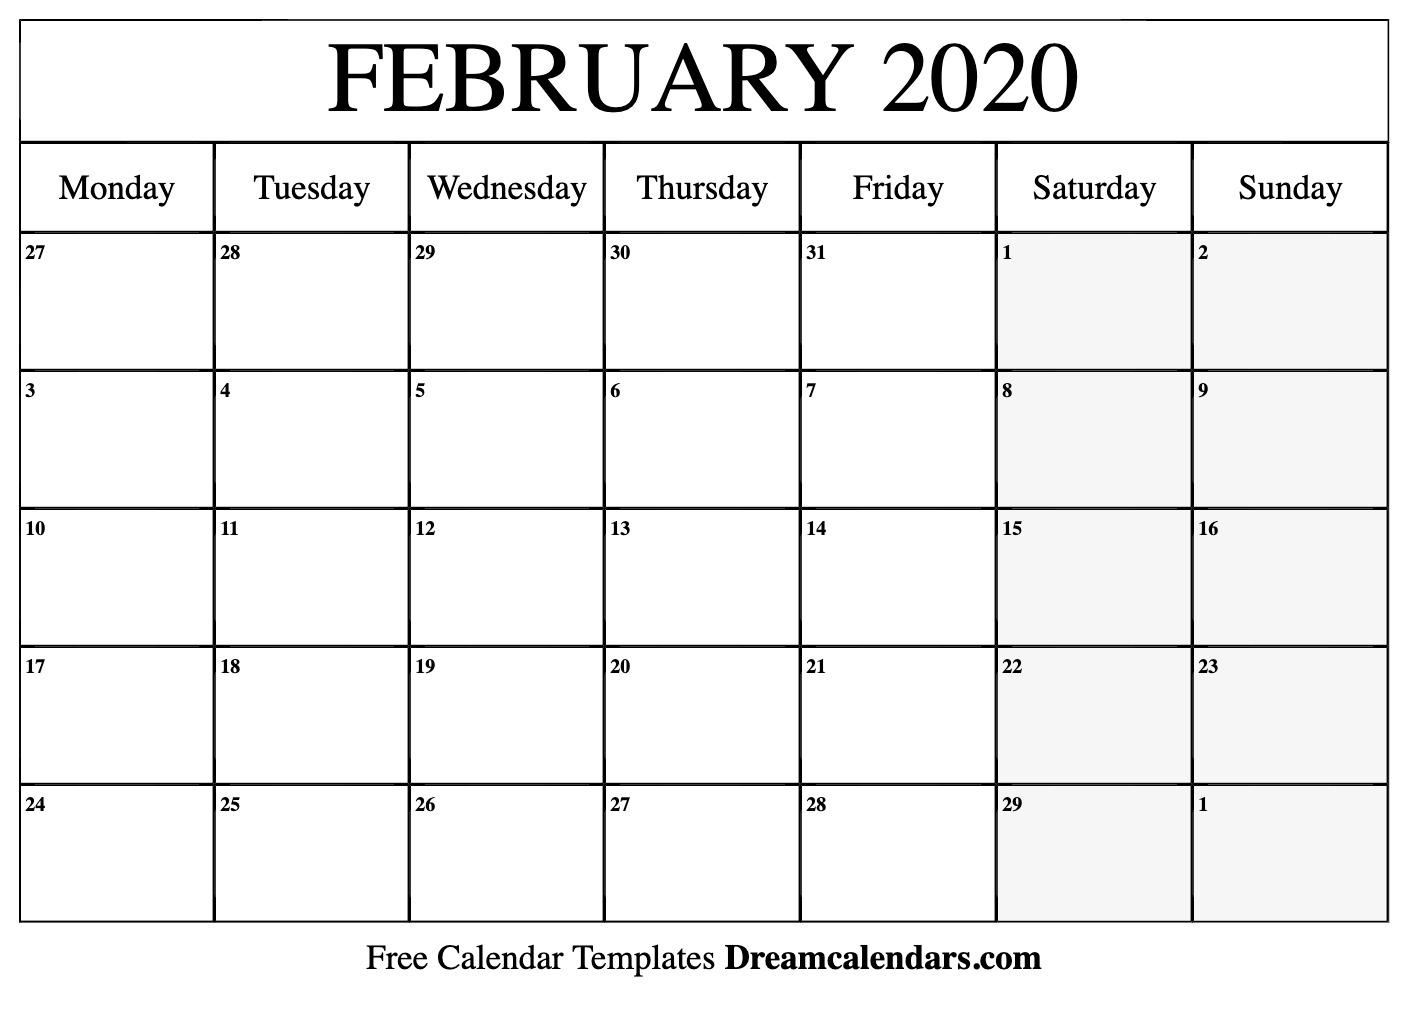 February 2020 Calendar   Free Blank Printable Templates